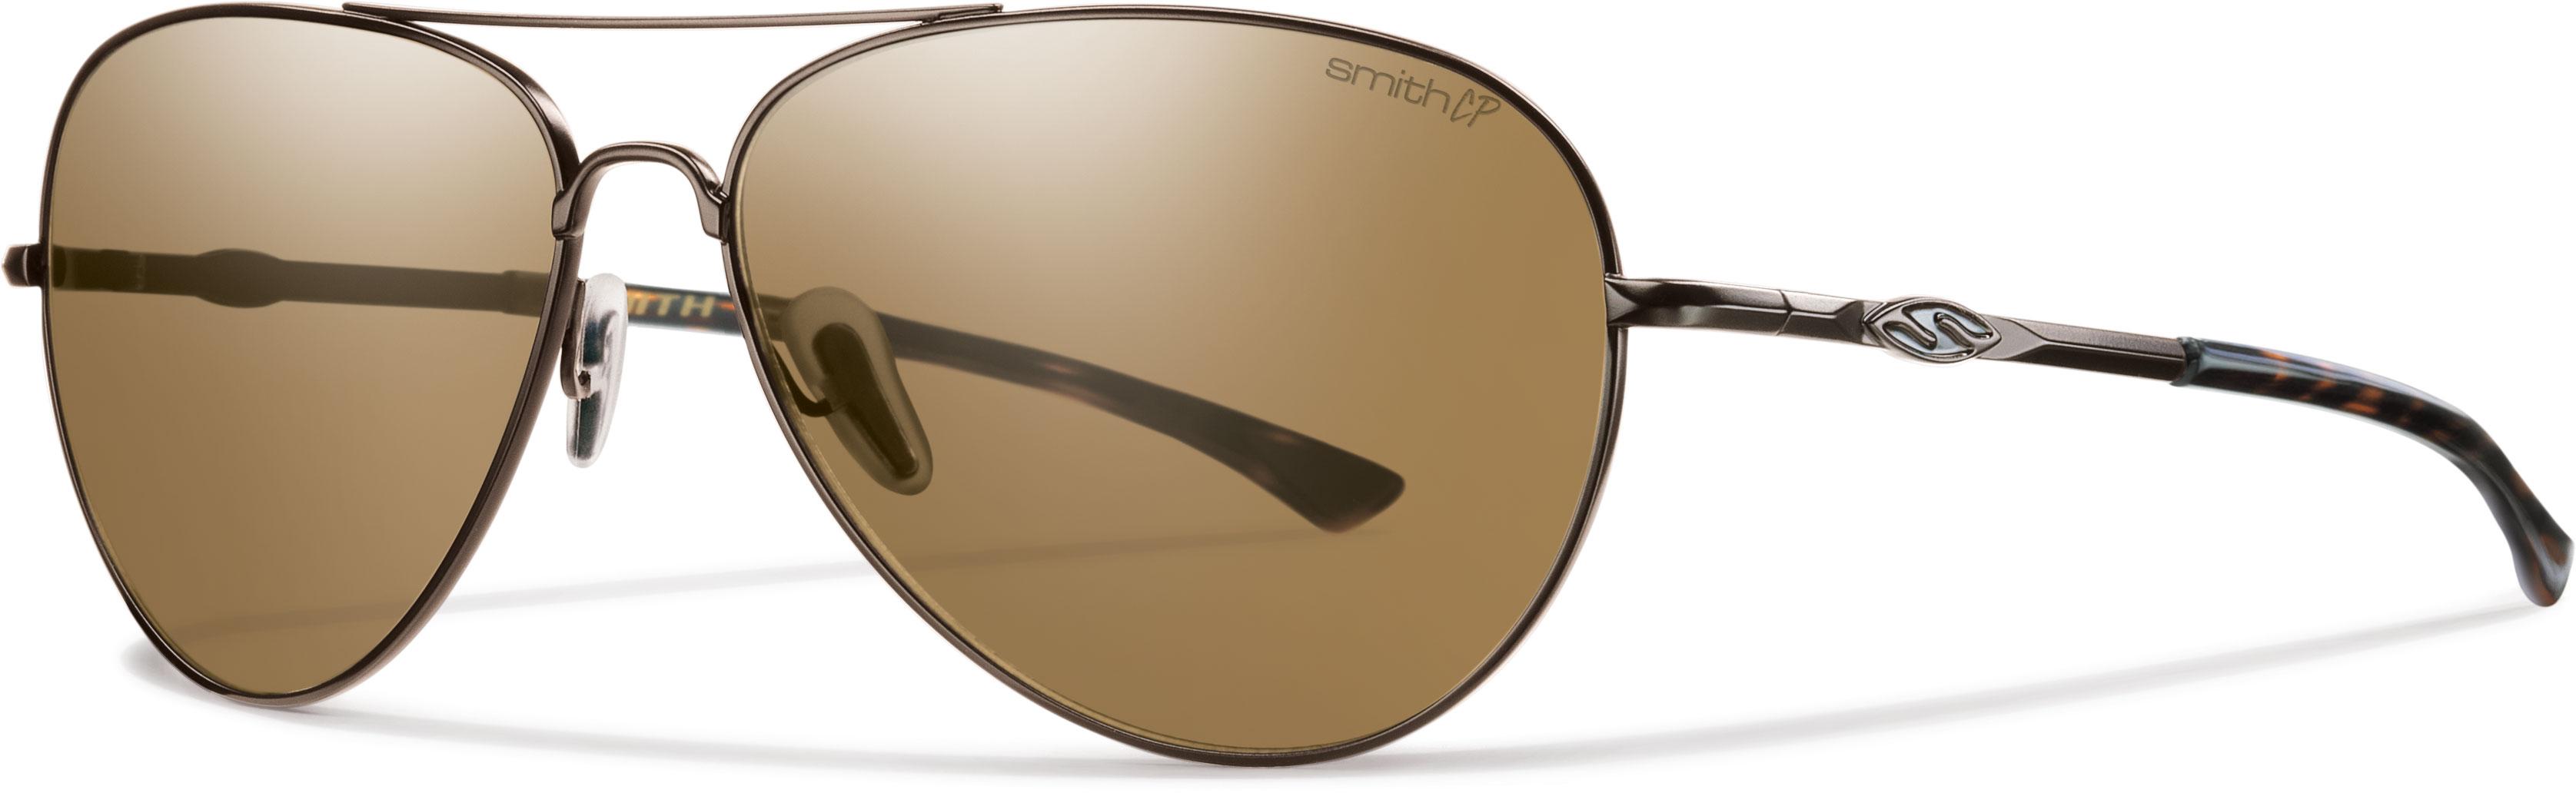 5188d03f3a Smith Optics Audible Polarized Sunglasses 715757437350